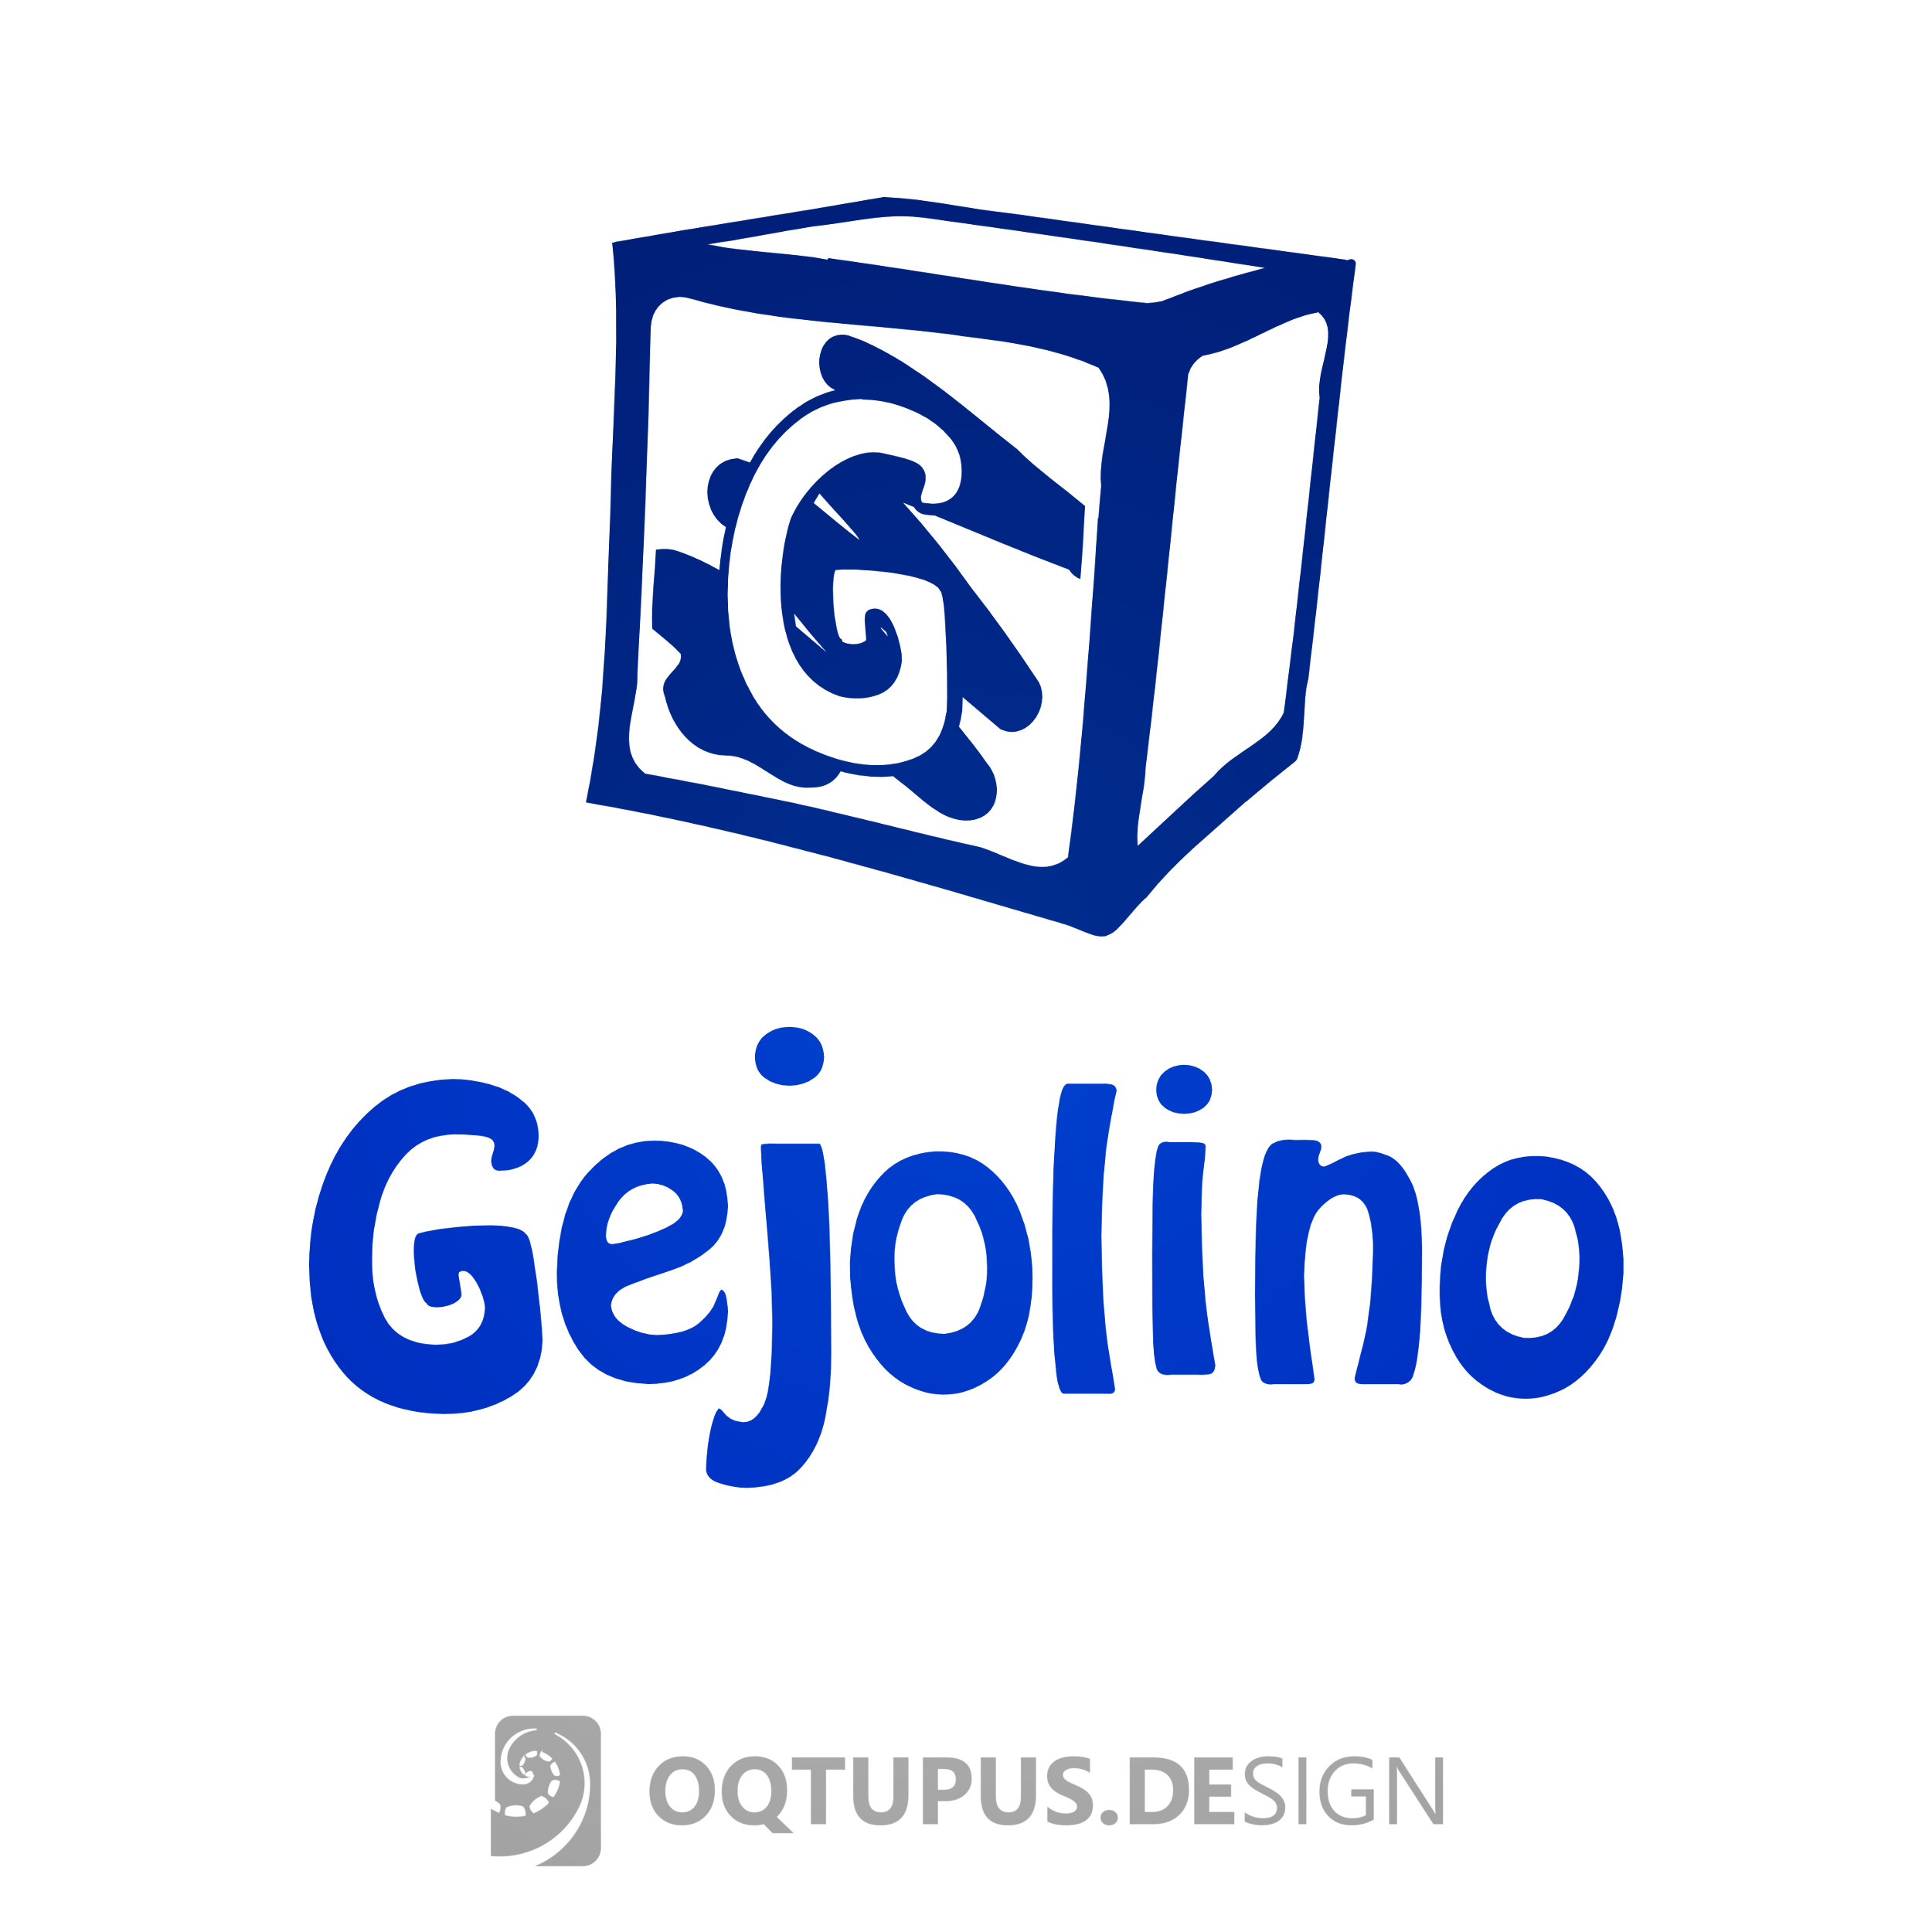 Design #28 de Oqtupus Design